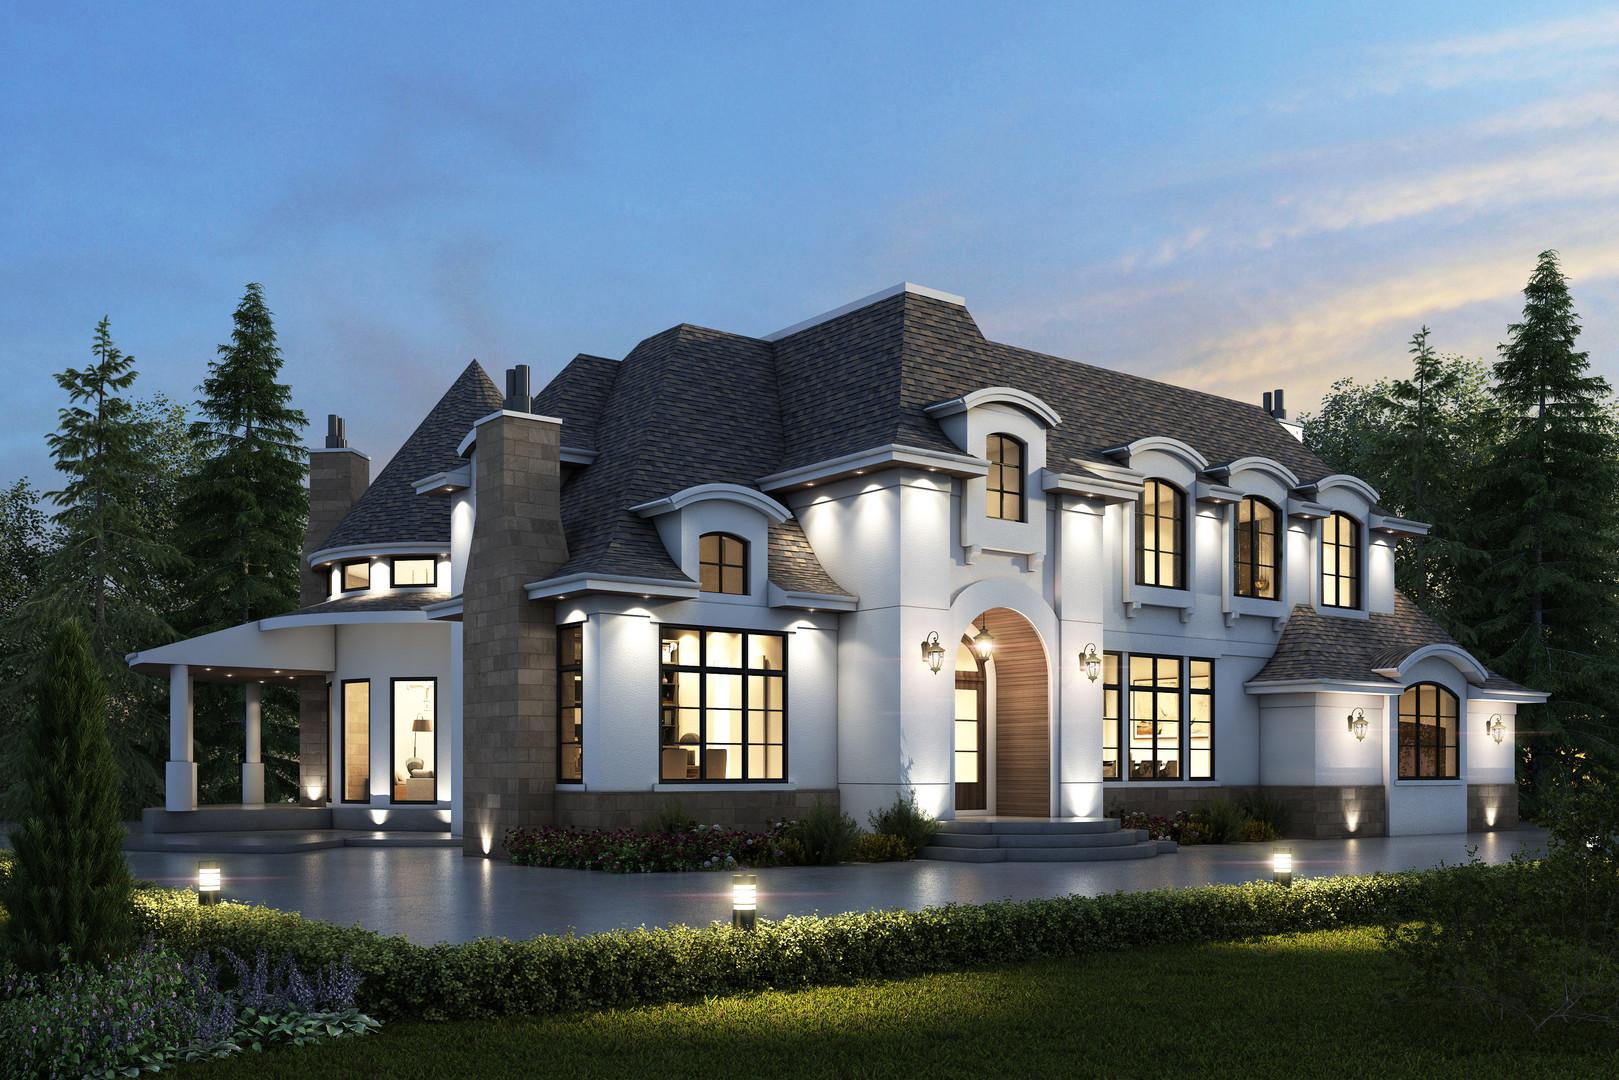 Acreage European Home Design .jpg